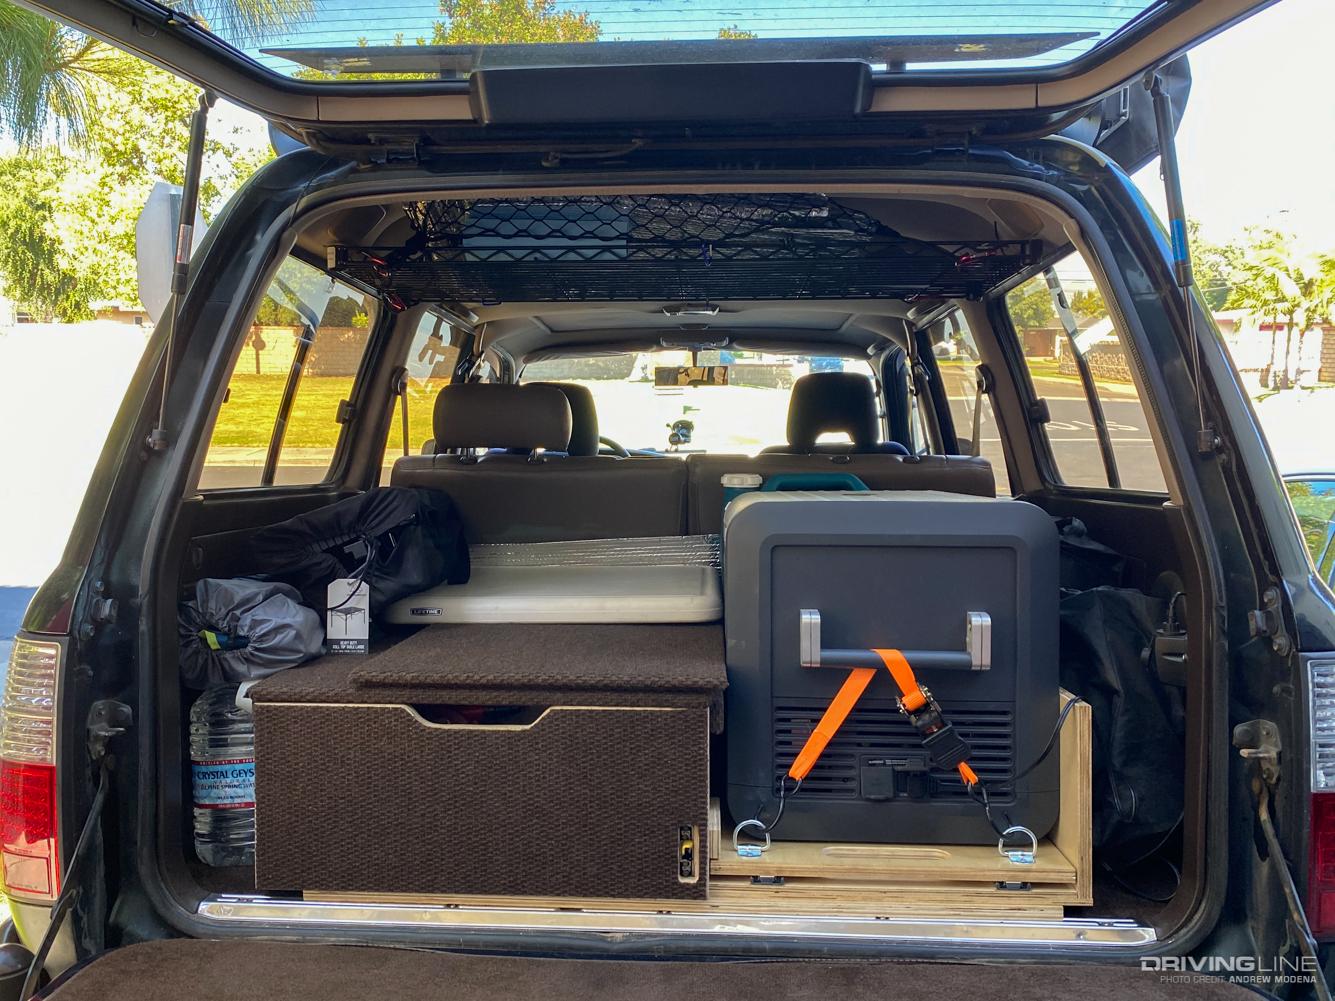 Overlanding Storage Solutions Should You Install A Drawer Or Sleeping Platform Drivingline